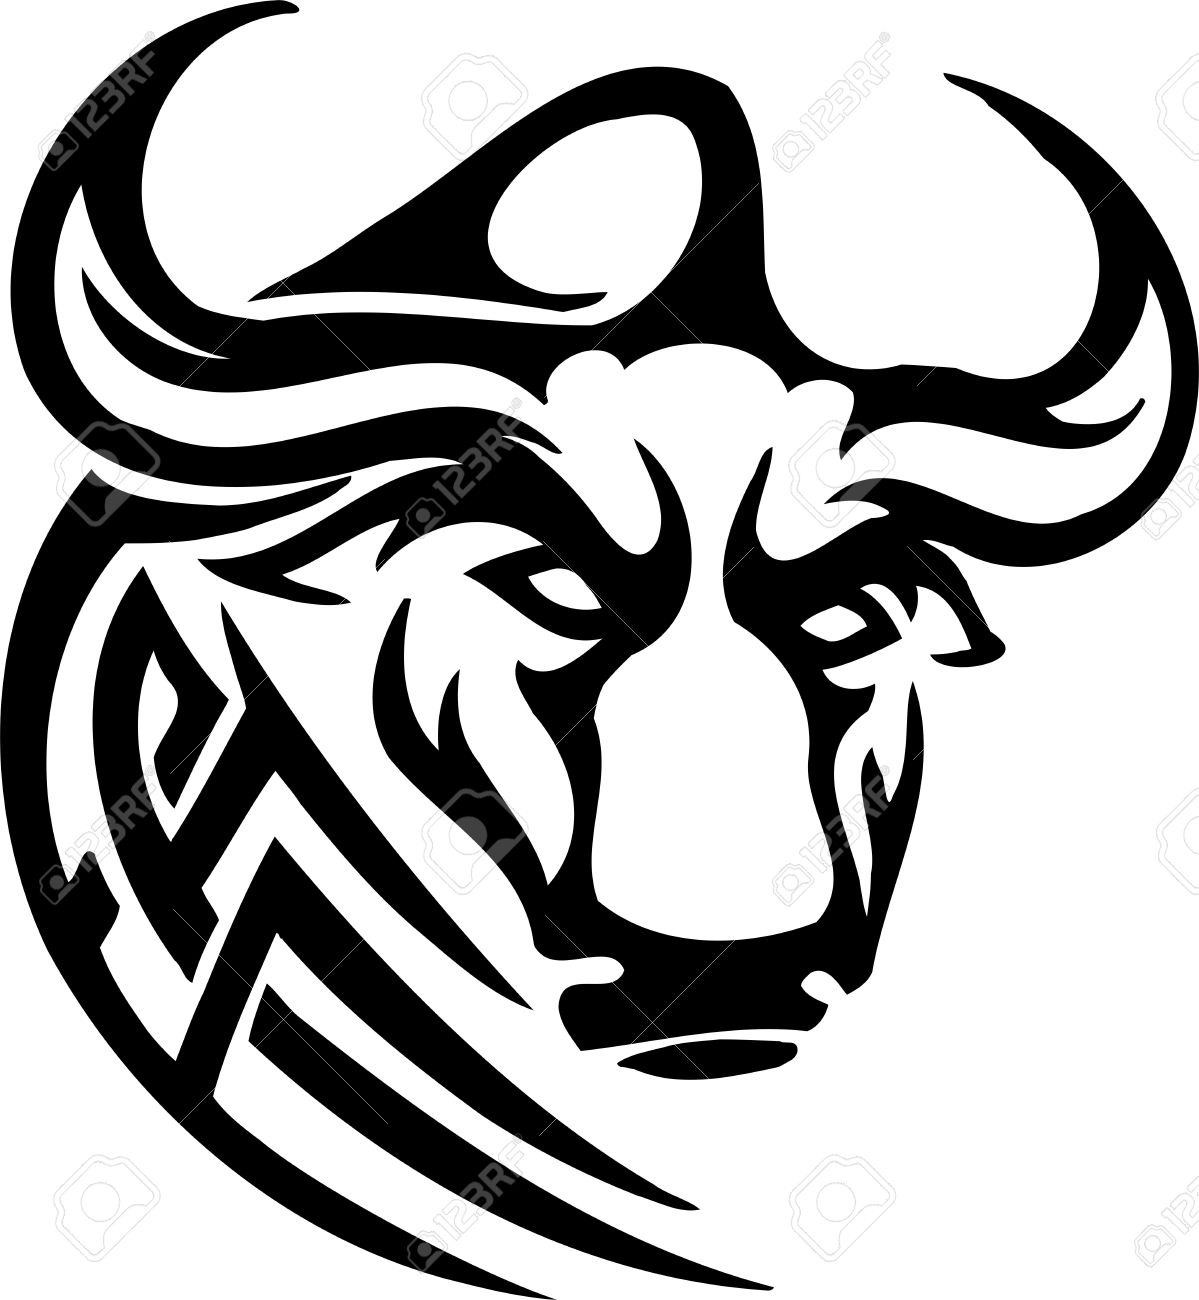 Bull in tribal style - vector image. Stock Vector - 12489665